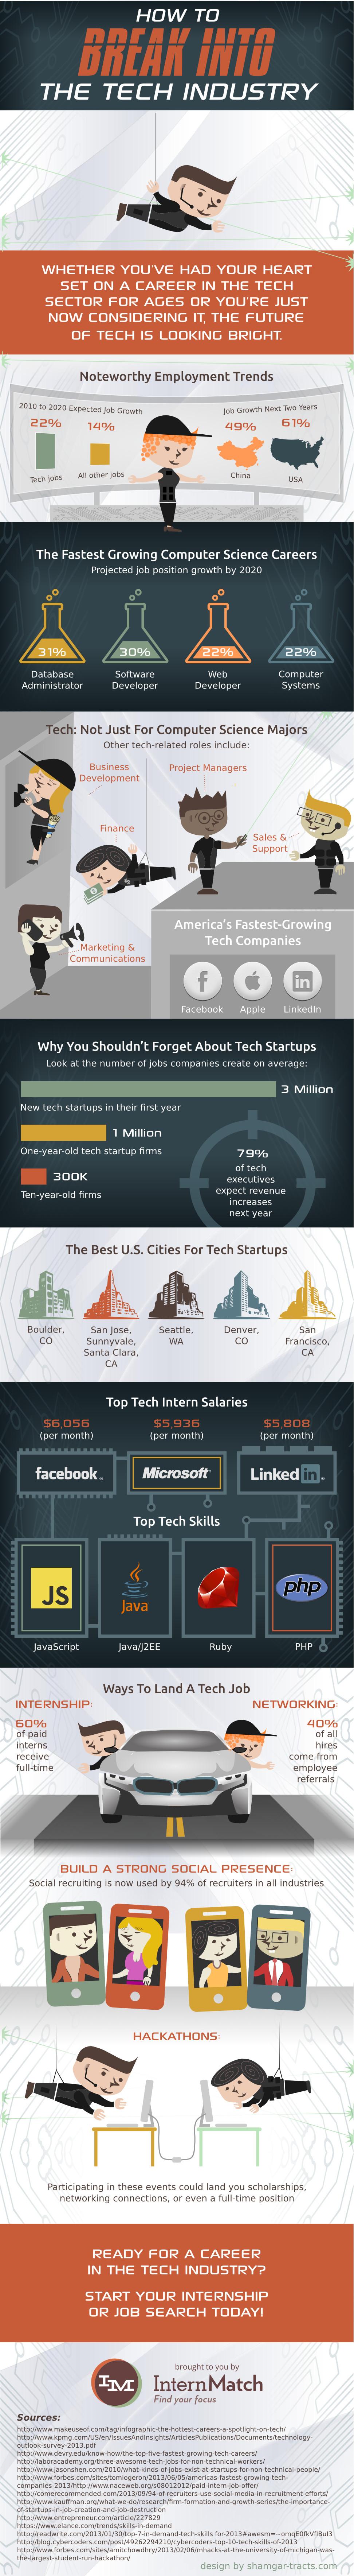 internmatch infographic